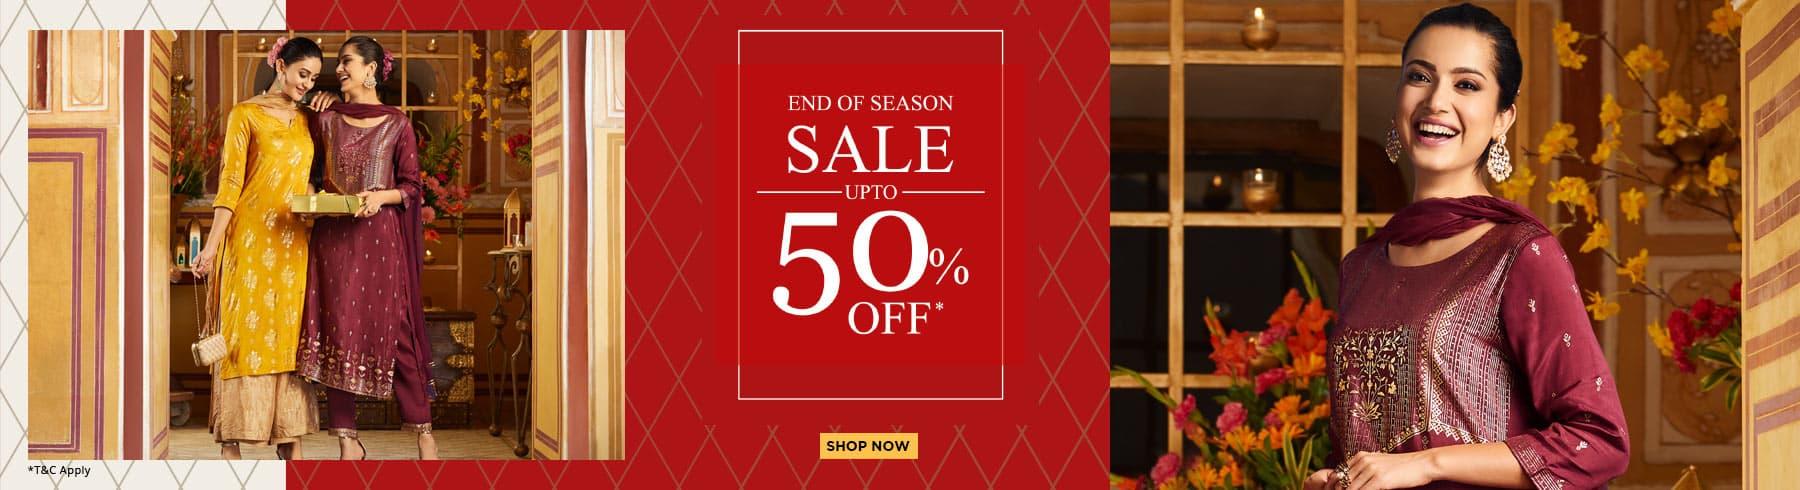 biba.in - Avail Flat 50% off on Women's Ethnic Fashion